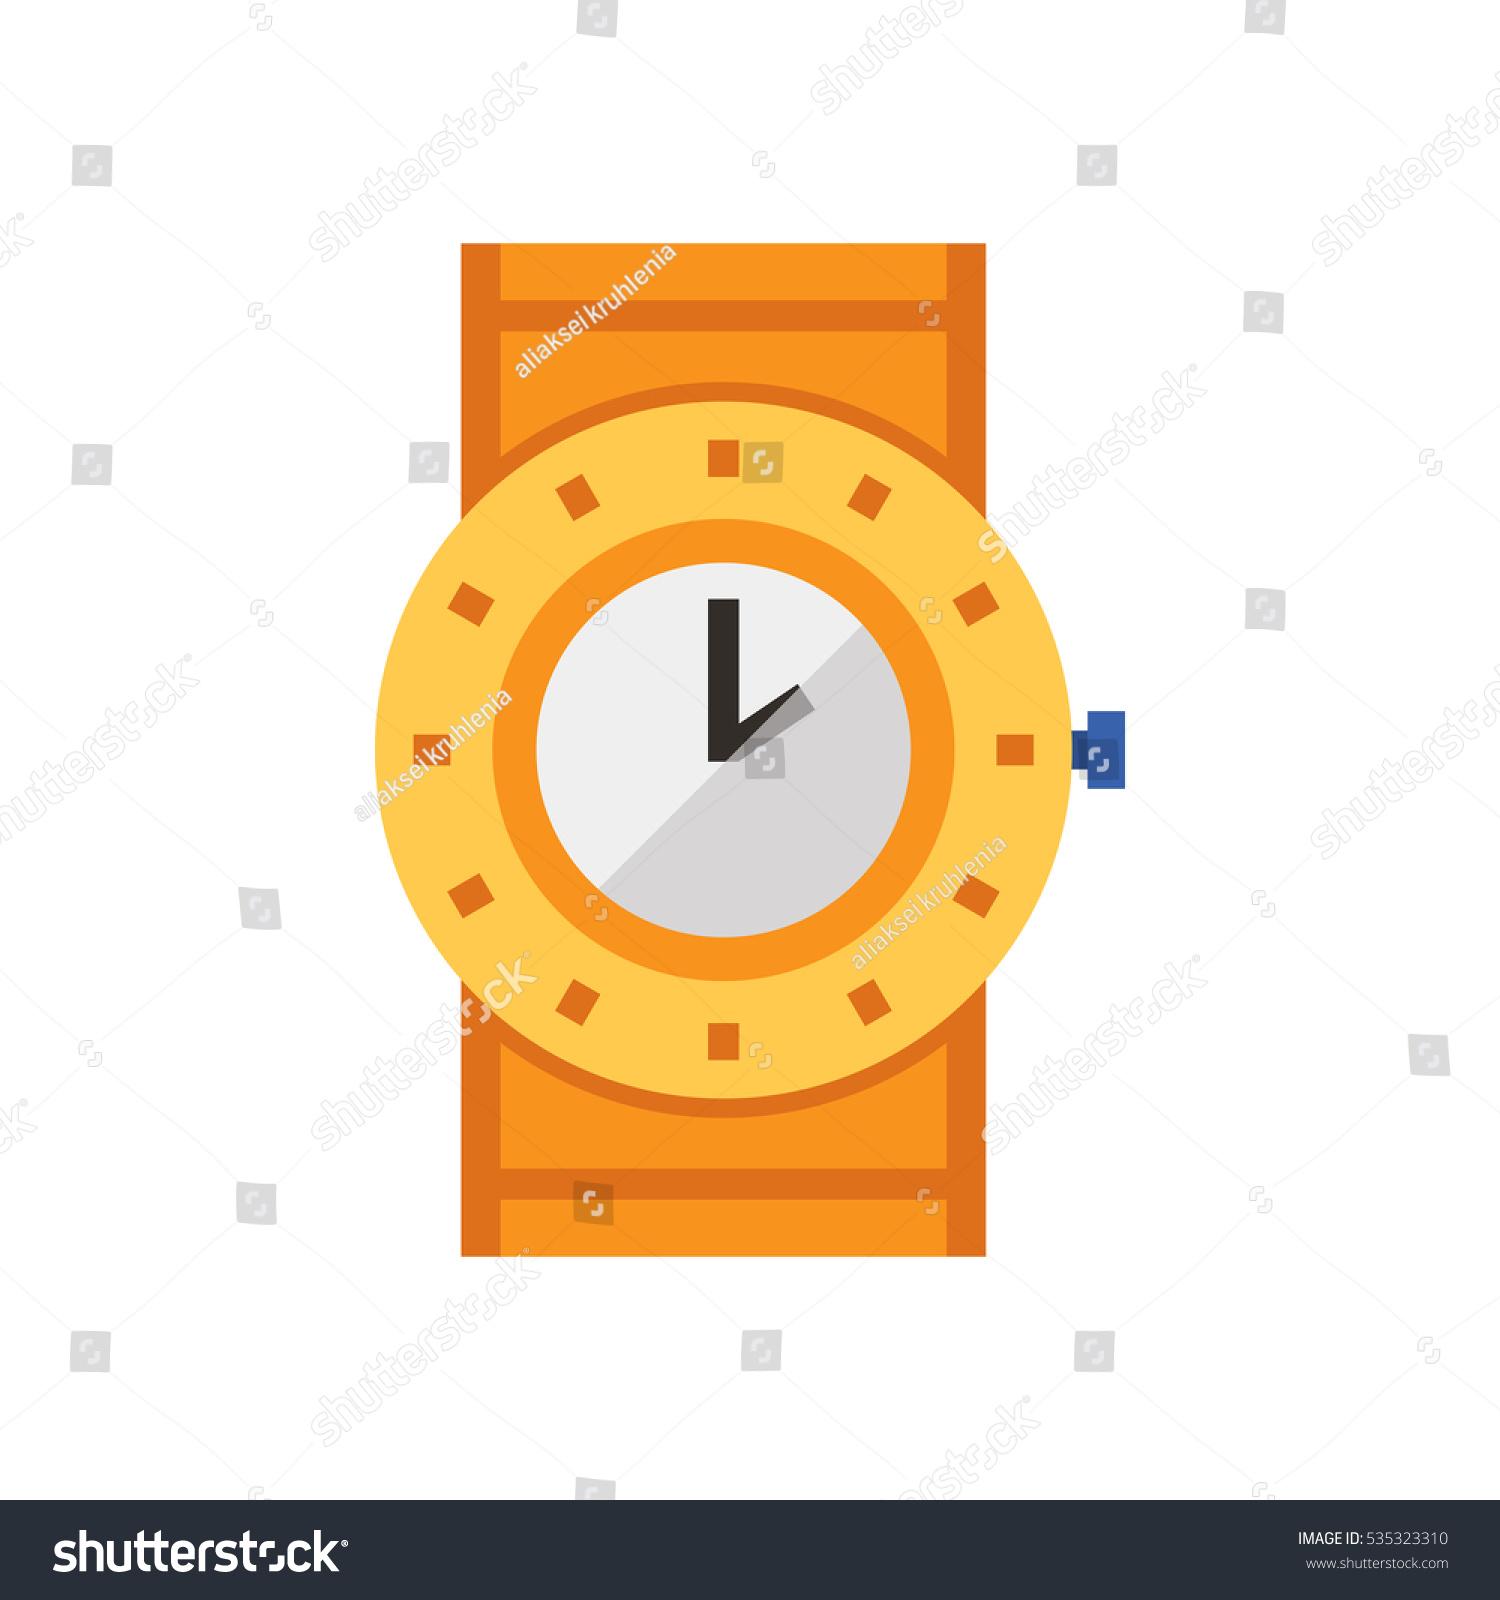 Sport Wrist Watch Vector Illustration Sports Stock Vector HD ...